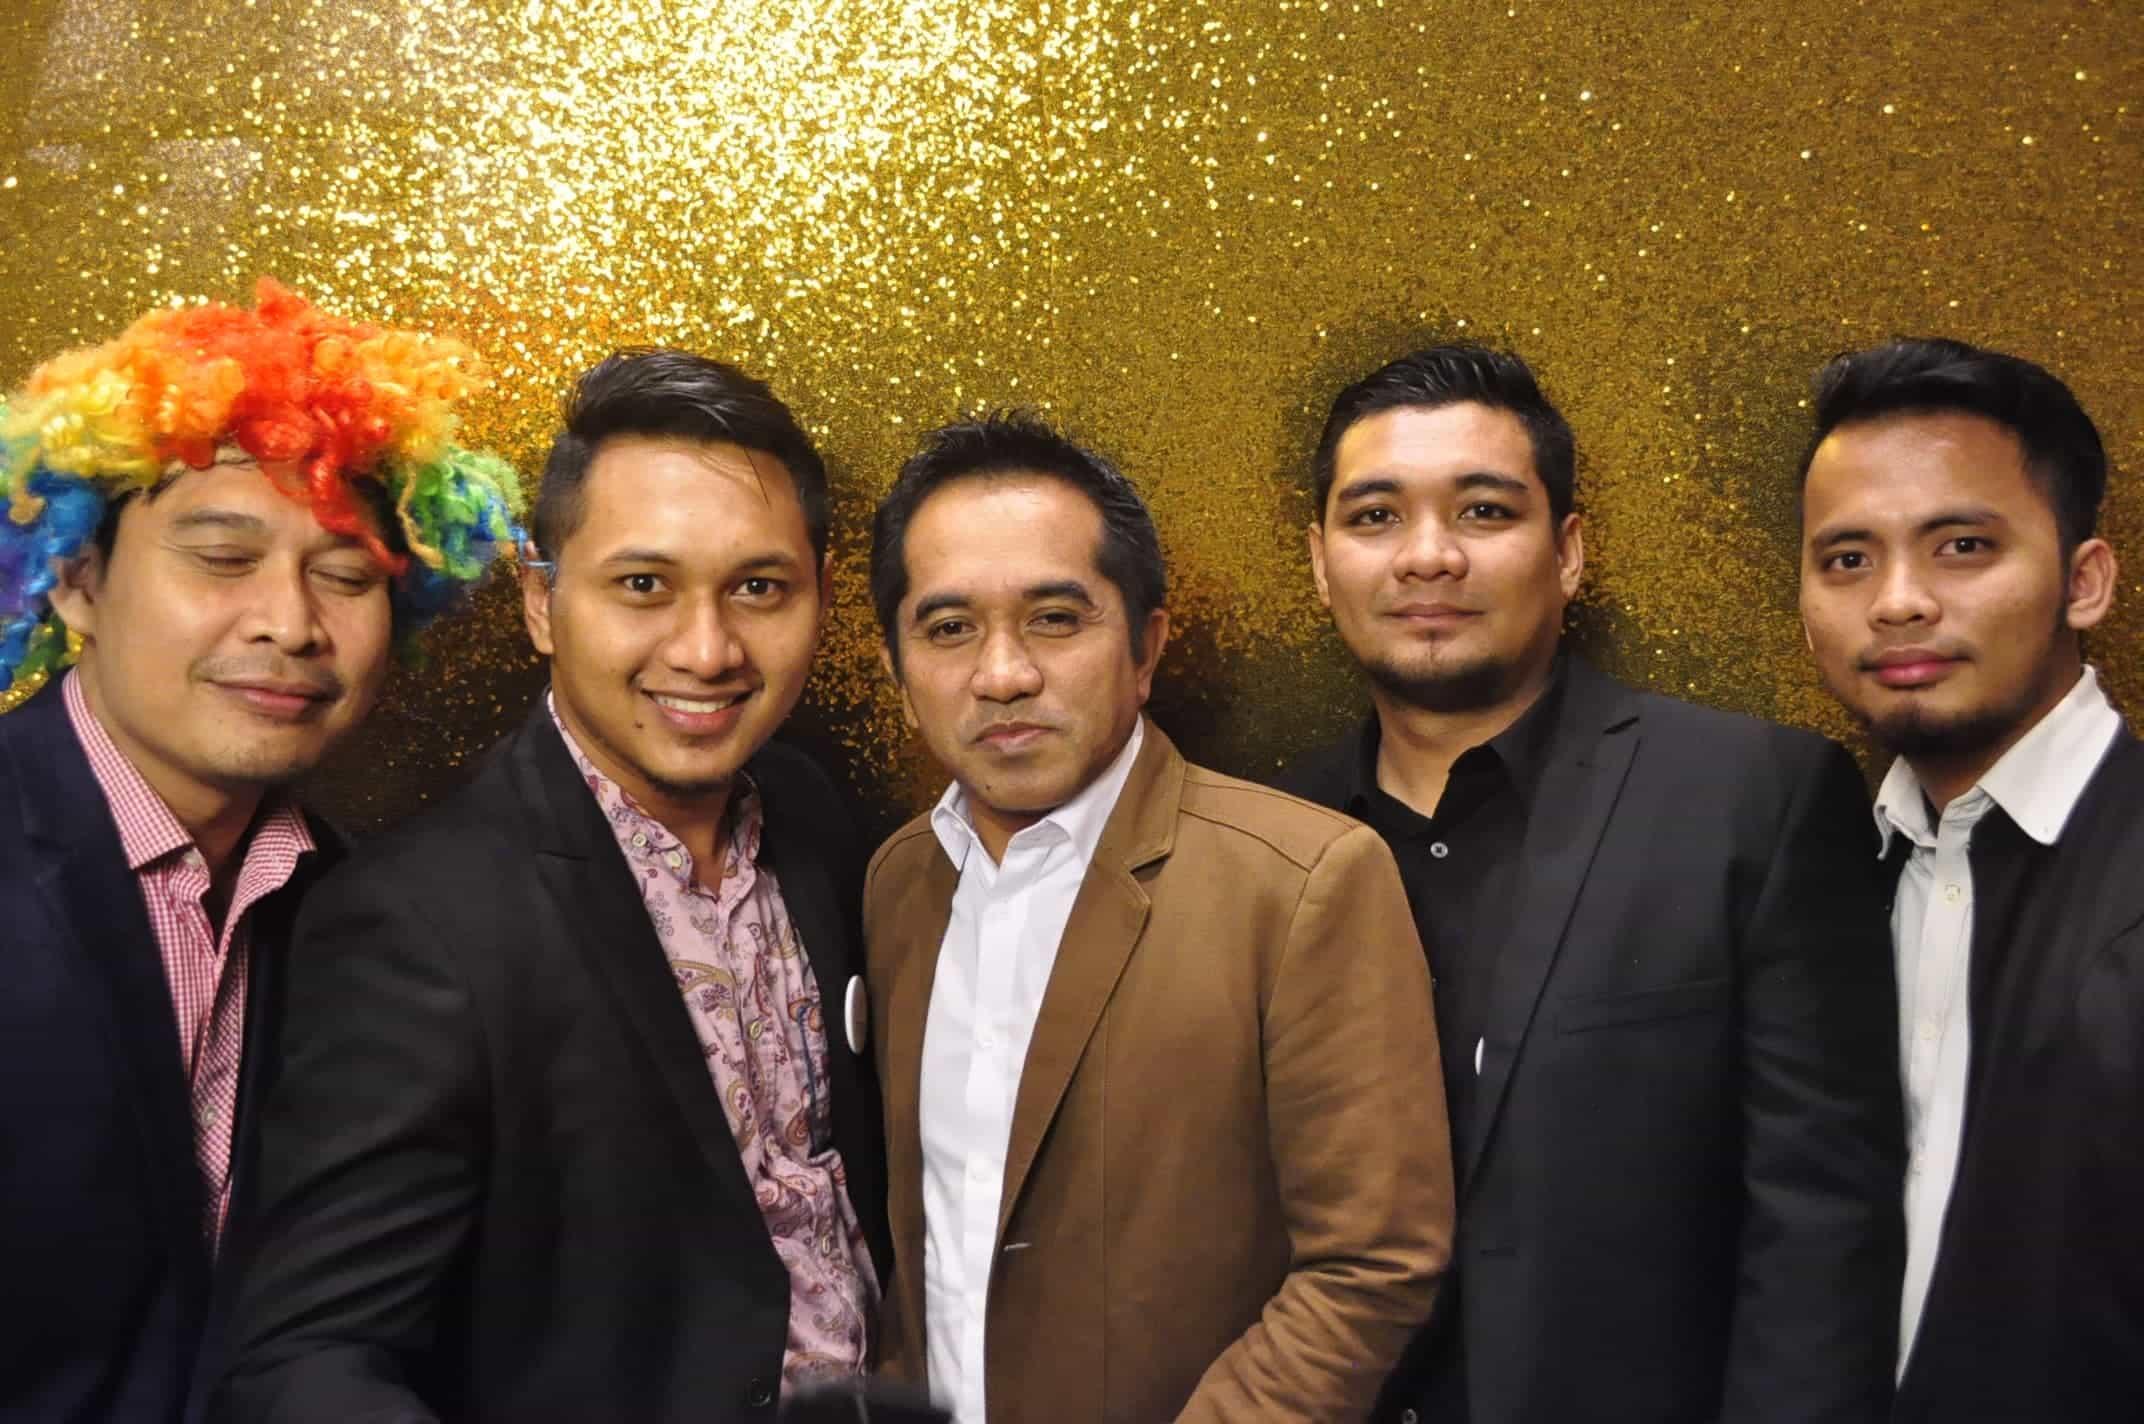 Malam Gala Anggun 2018 (Photobooth) 3